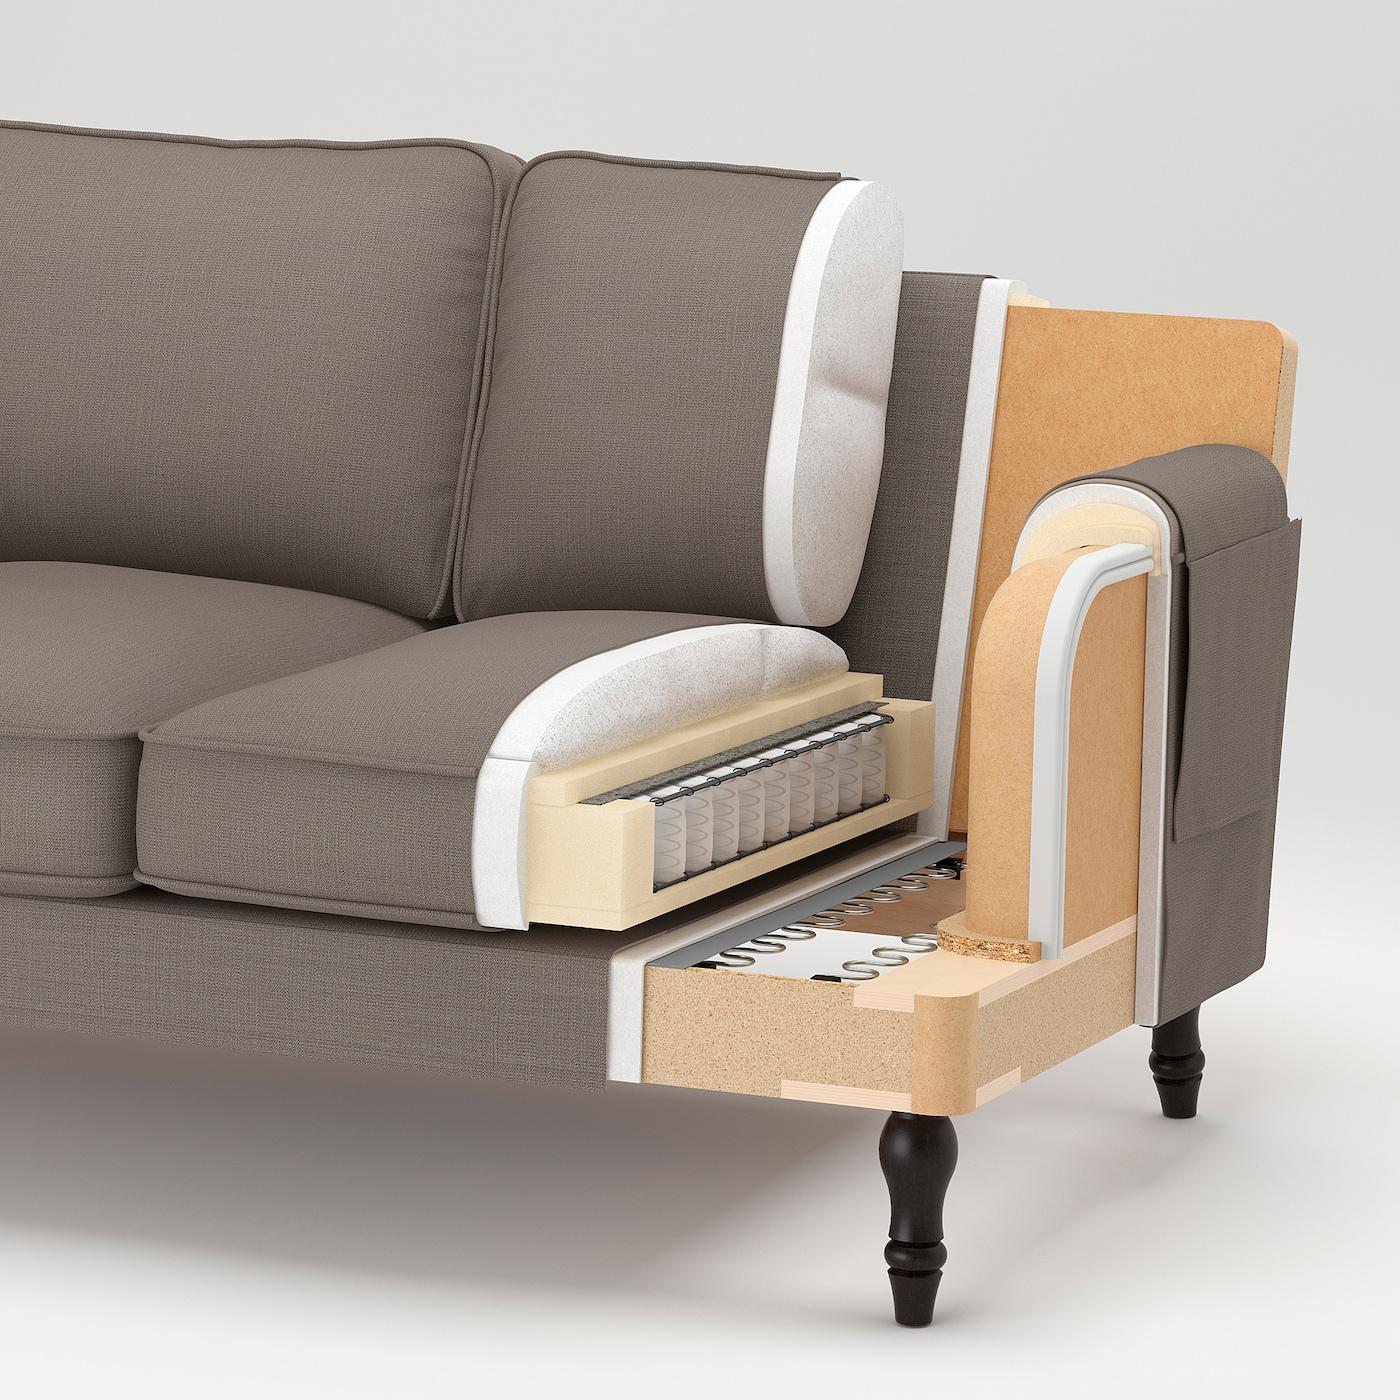 STOCKSUND 3-seat sofa - Segersta multicolour/black/wood